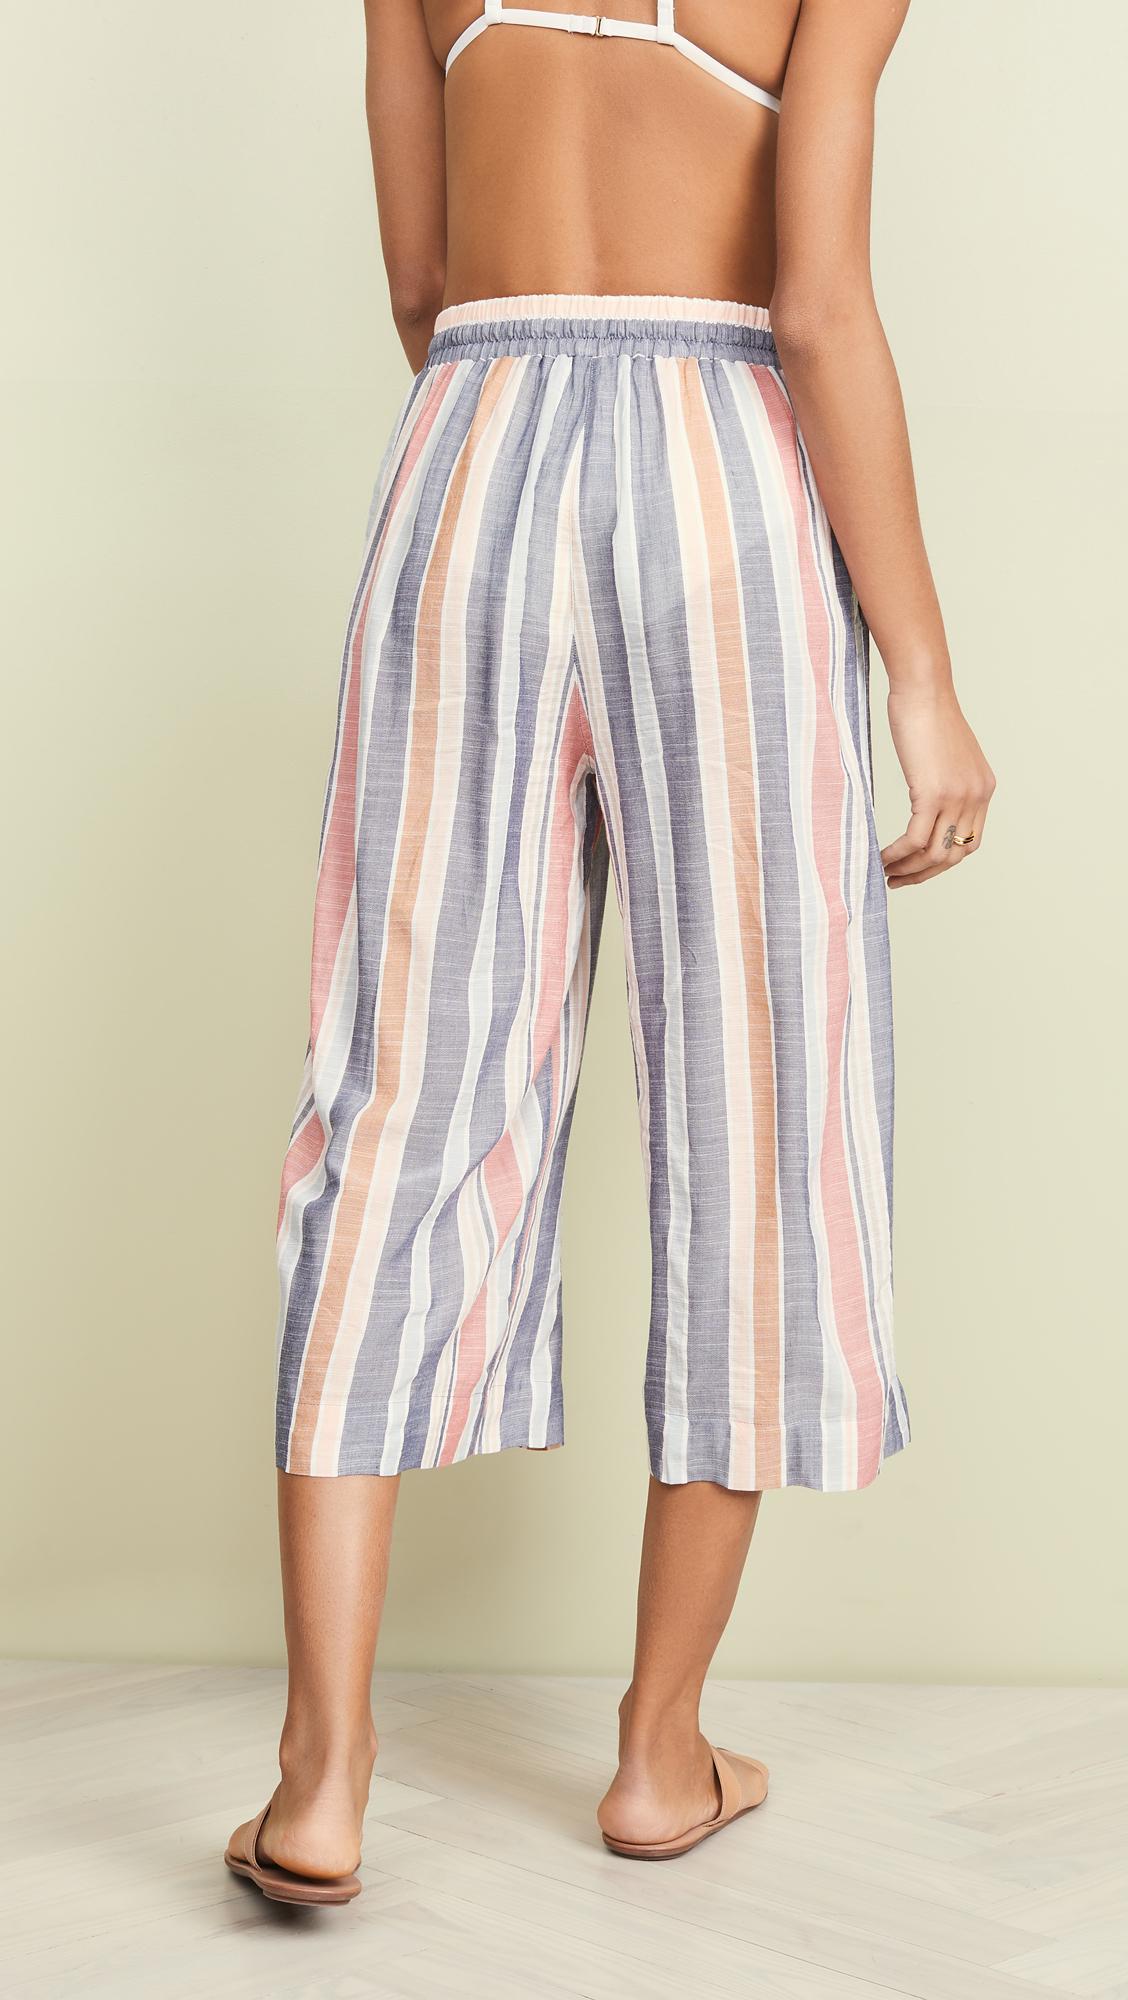 bb1efc37ca Madewell - Multicolor Wide Leg Beach Pants - Lyst. View fullscreen